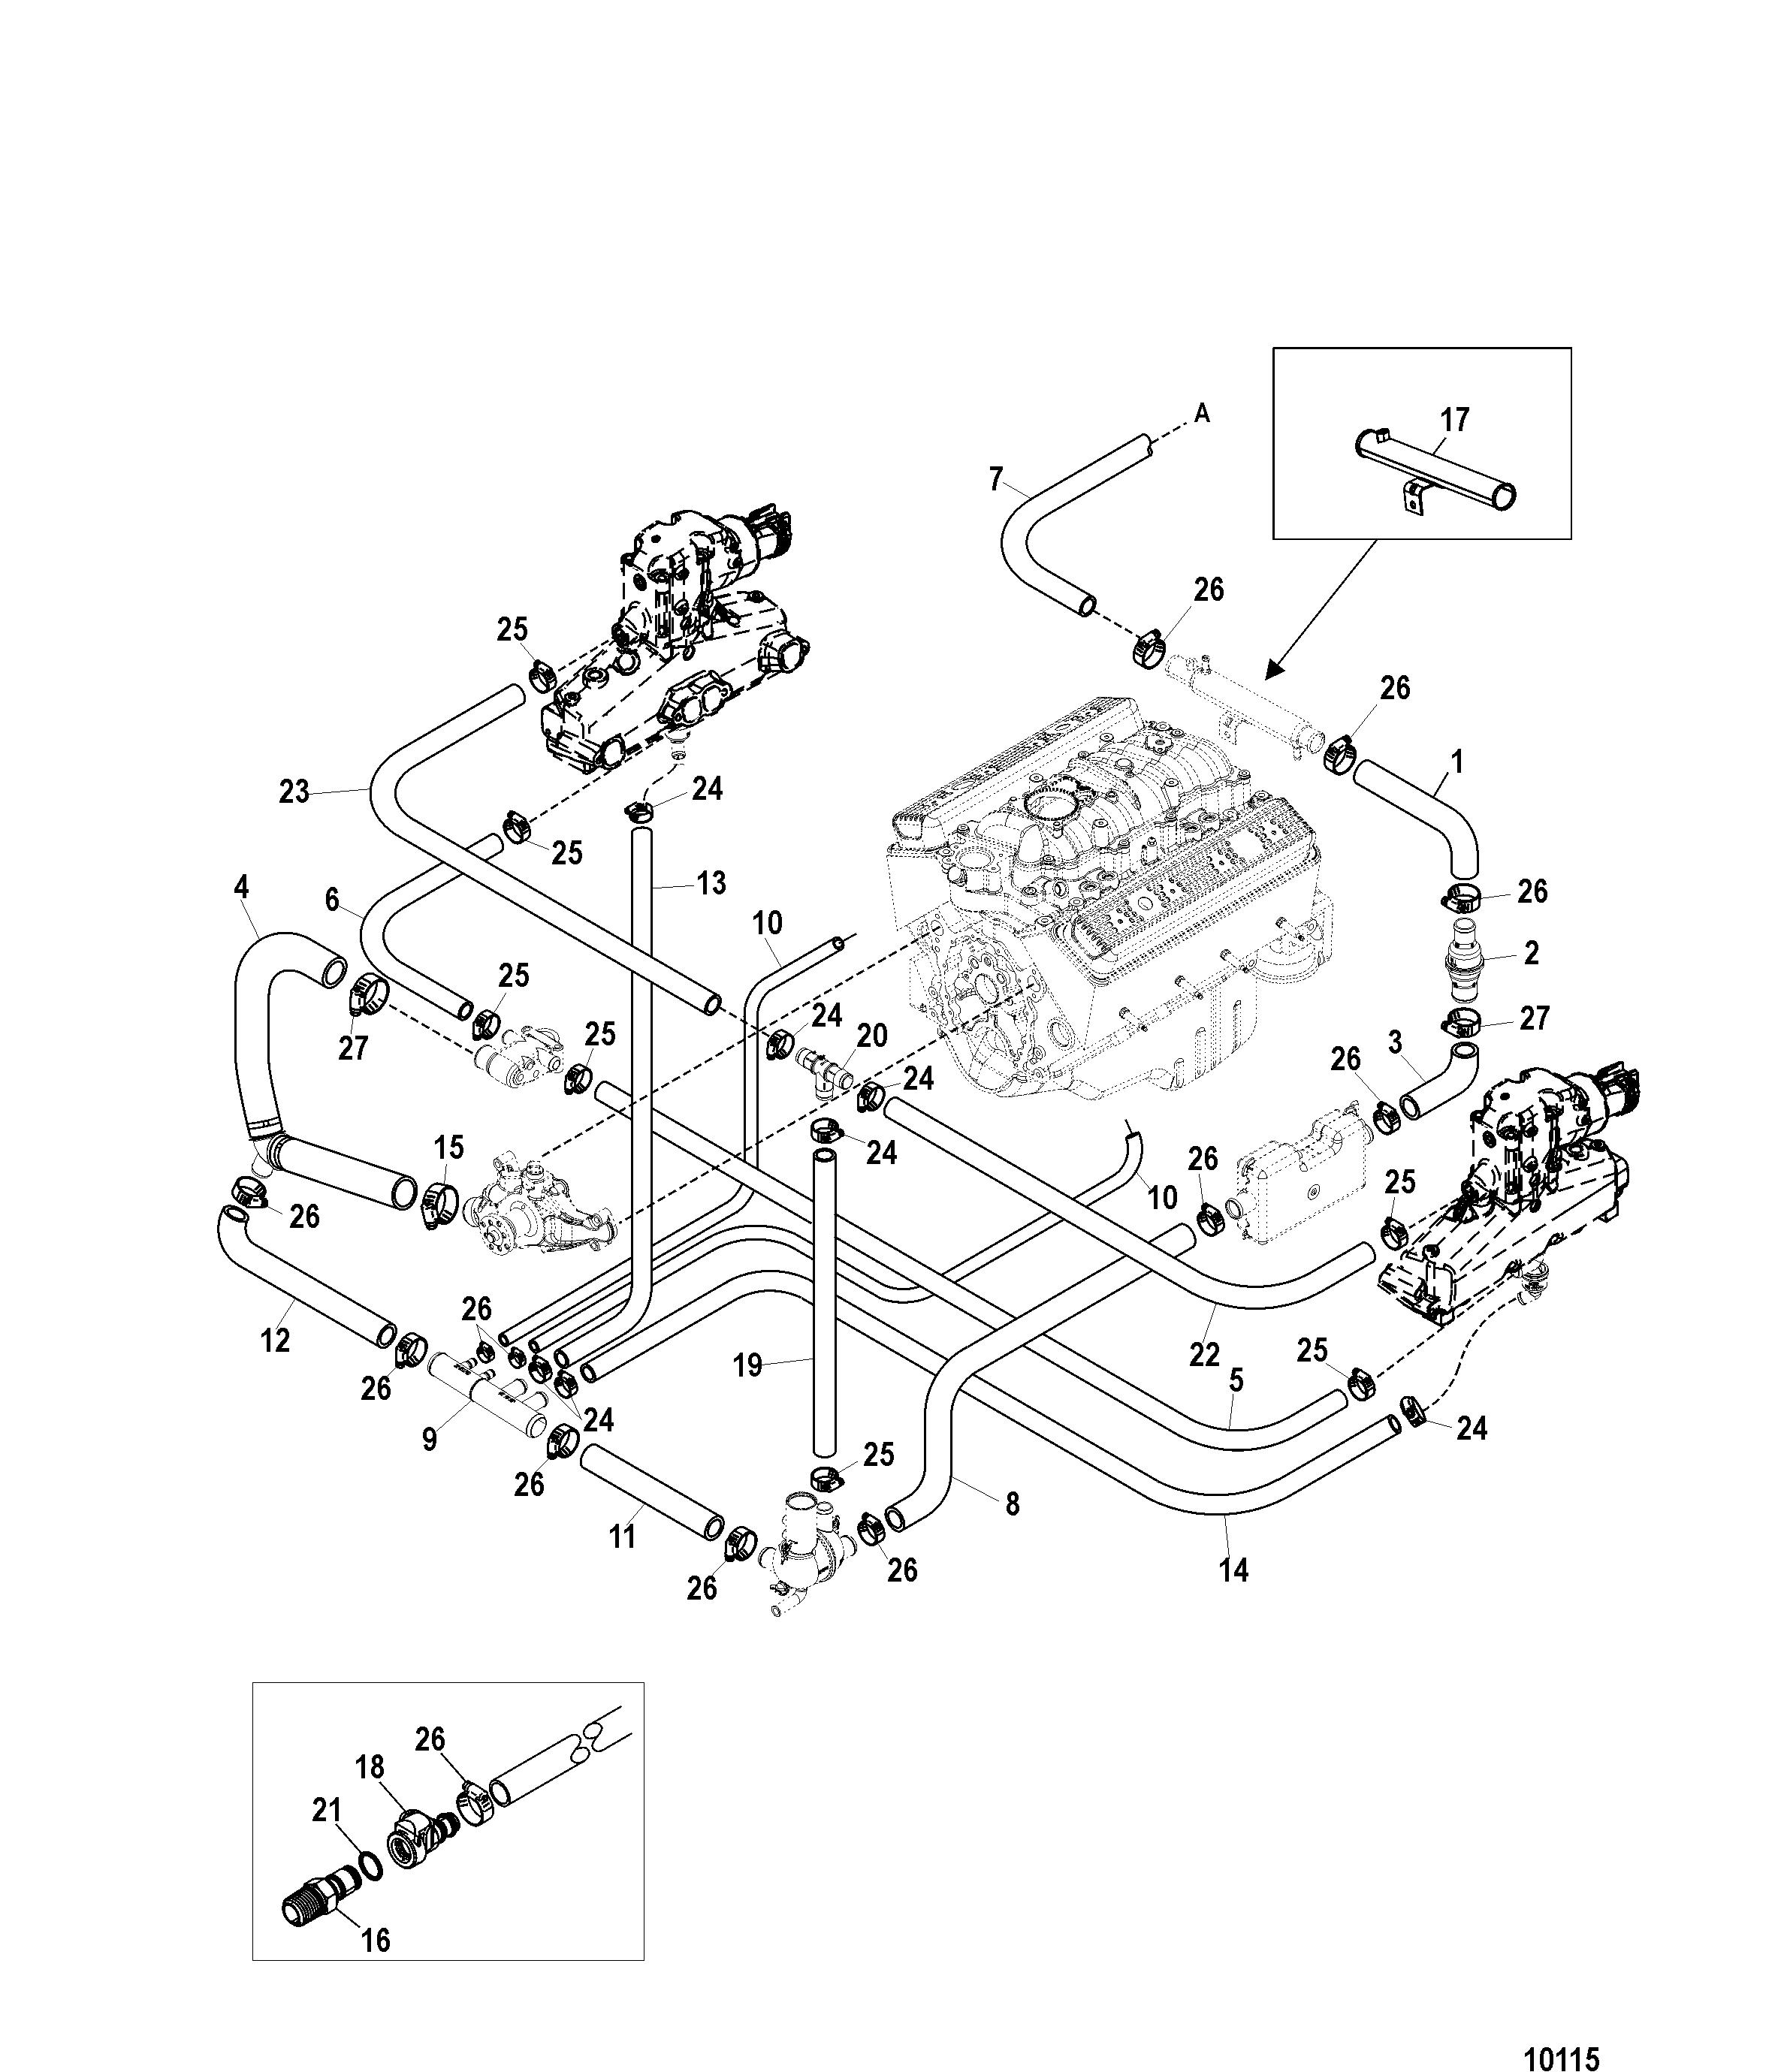 Mercruiser Ignition Diagram Likewise Mercruiser Coil Wiring Diagram